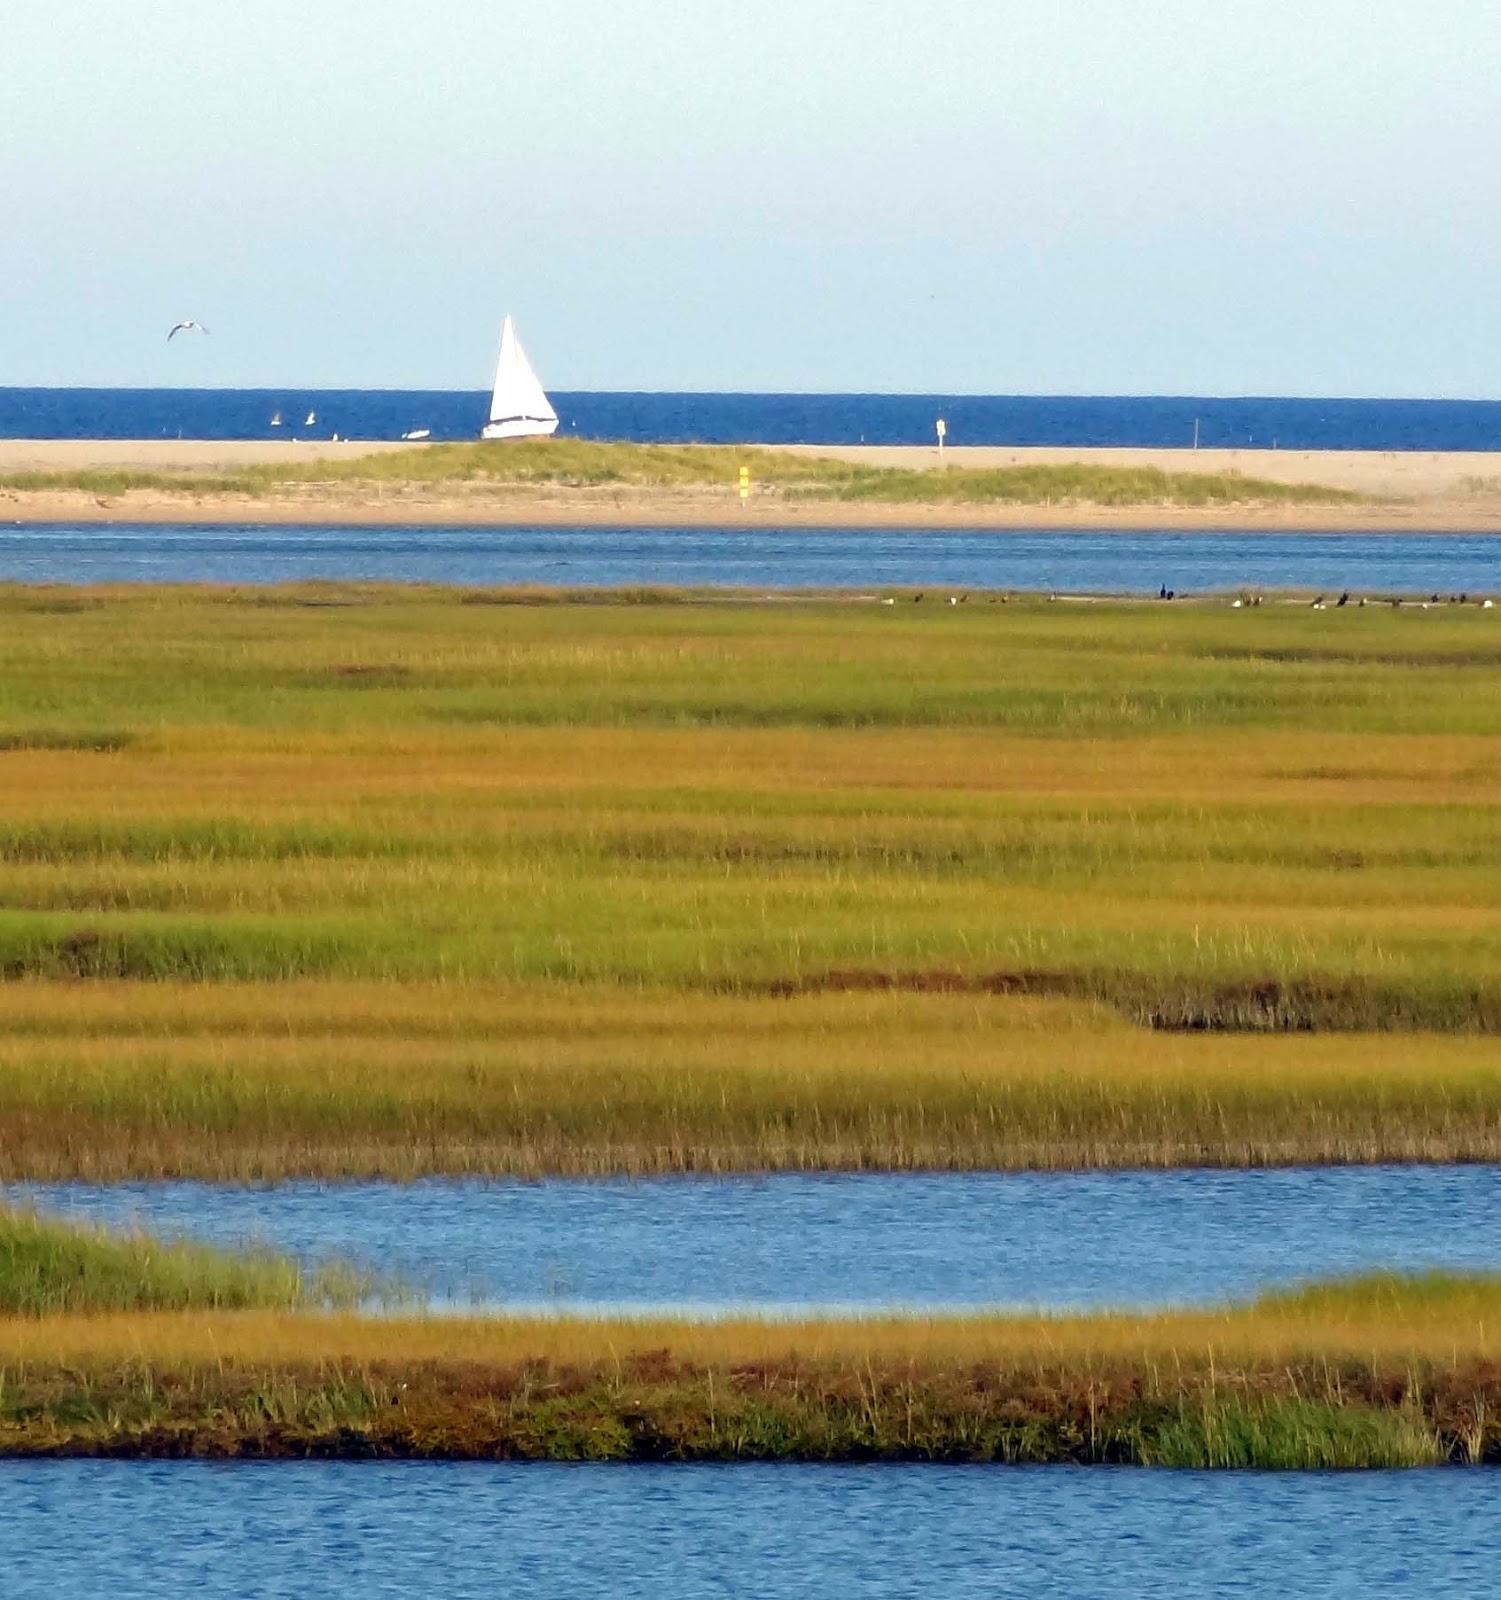 Cape Cod National Sea Shore: Joe's Retirement Blog: Fort Hill, Eastham, Cape Cod